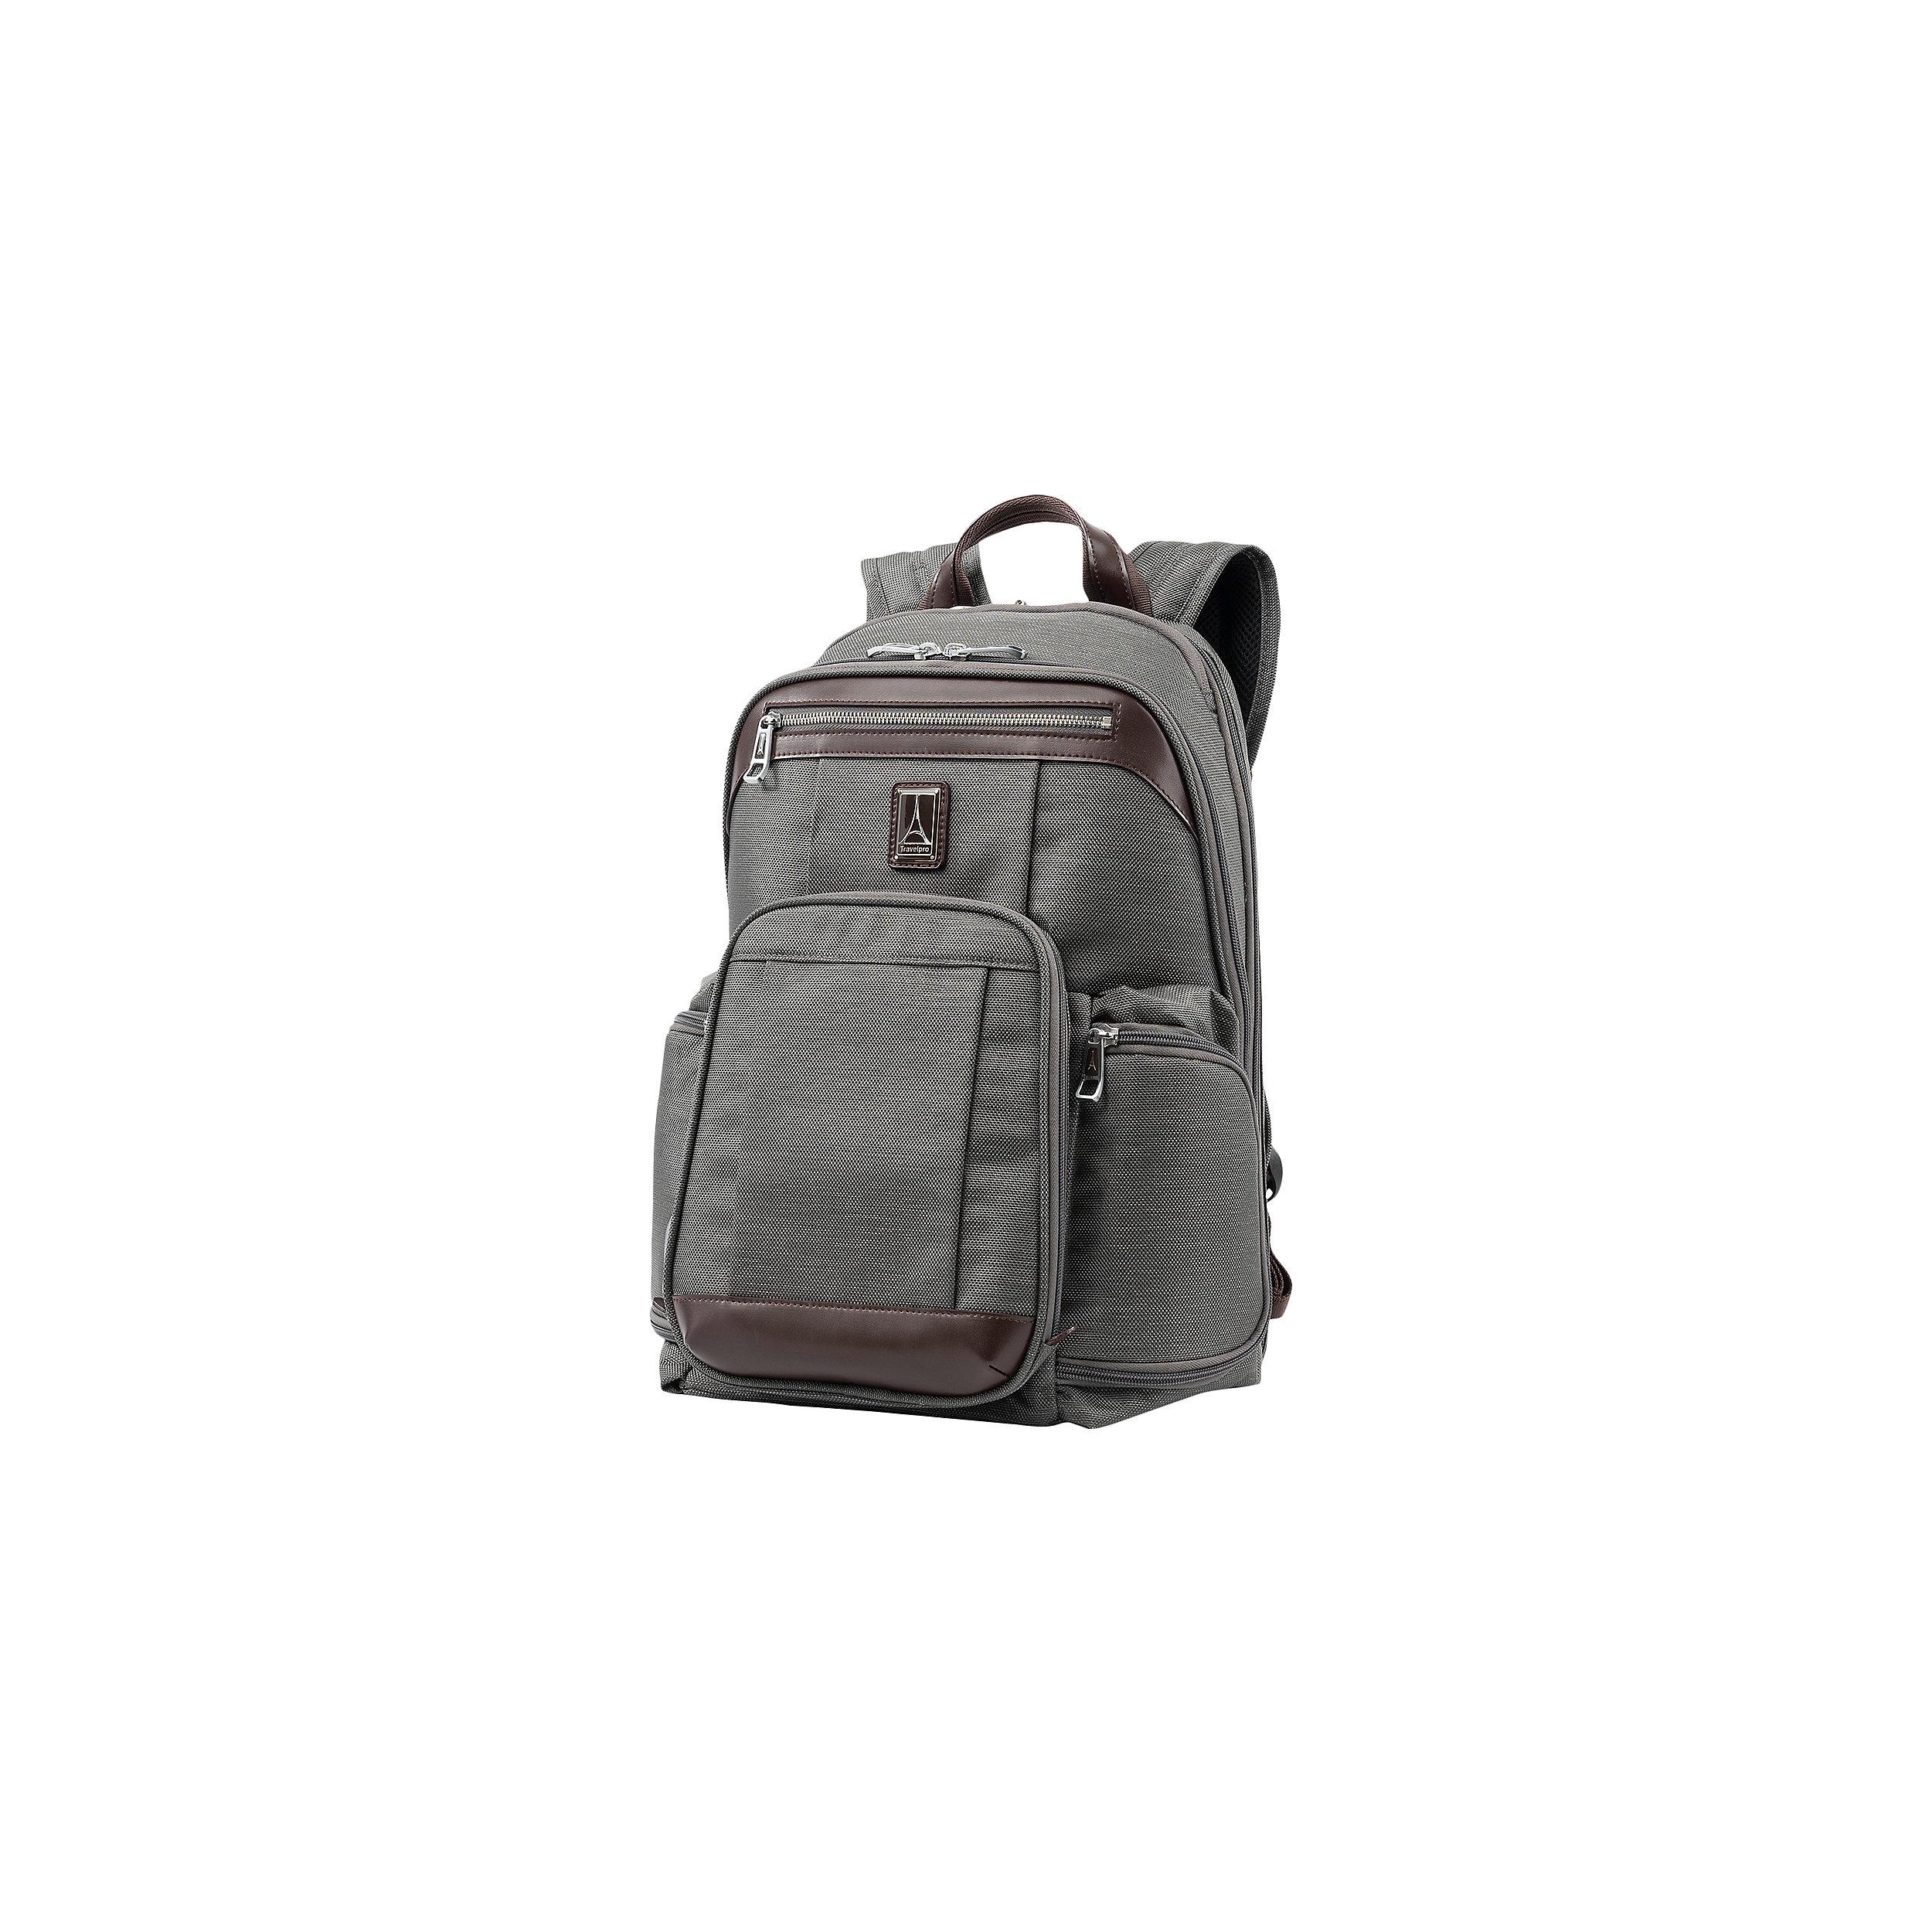 Business Backpack 15.6 Inch RFID Platinum Elite Medium 23 Liter